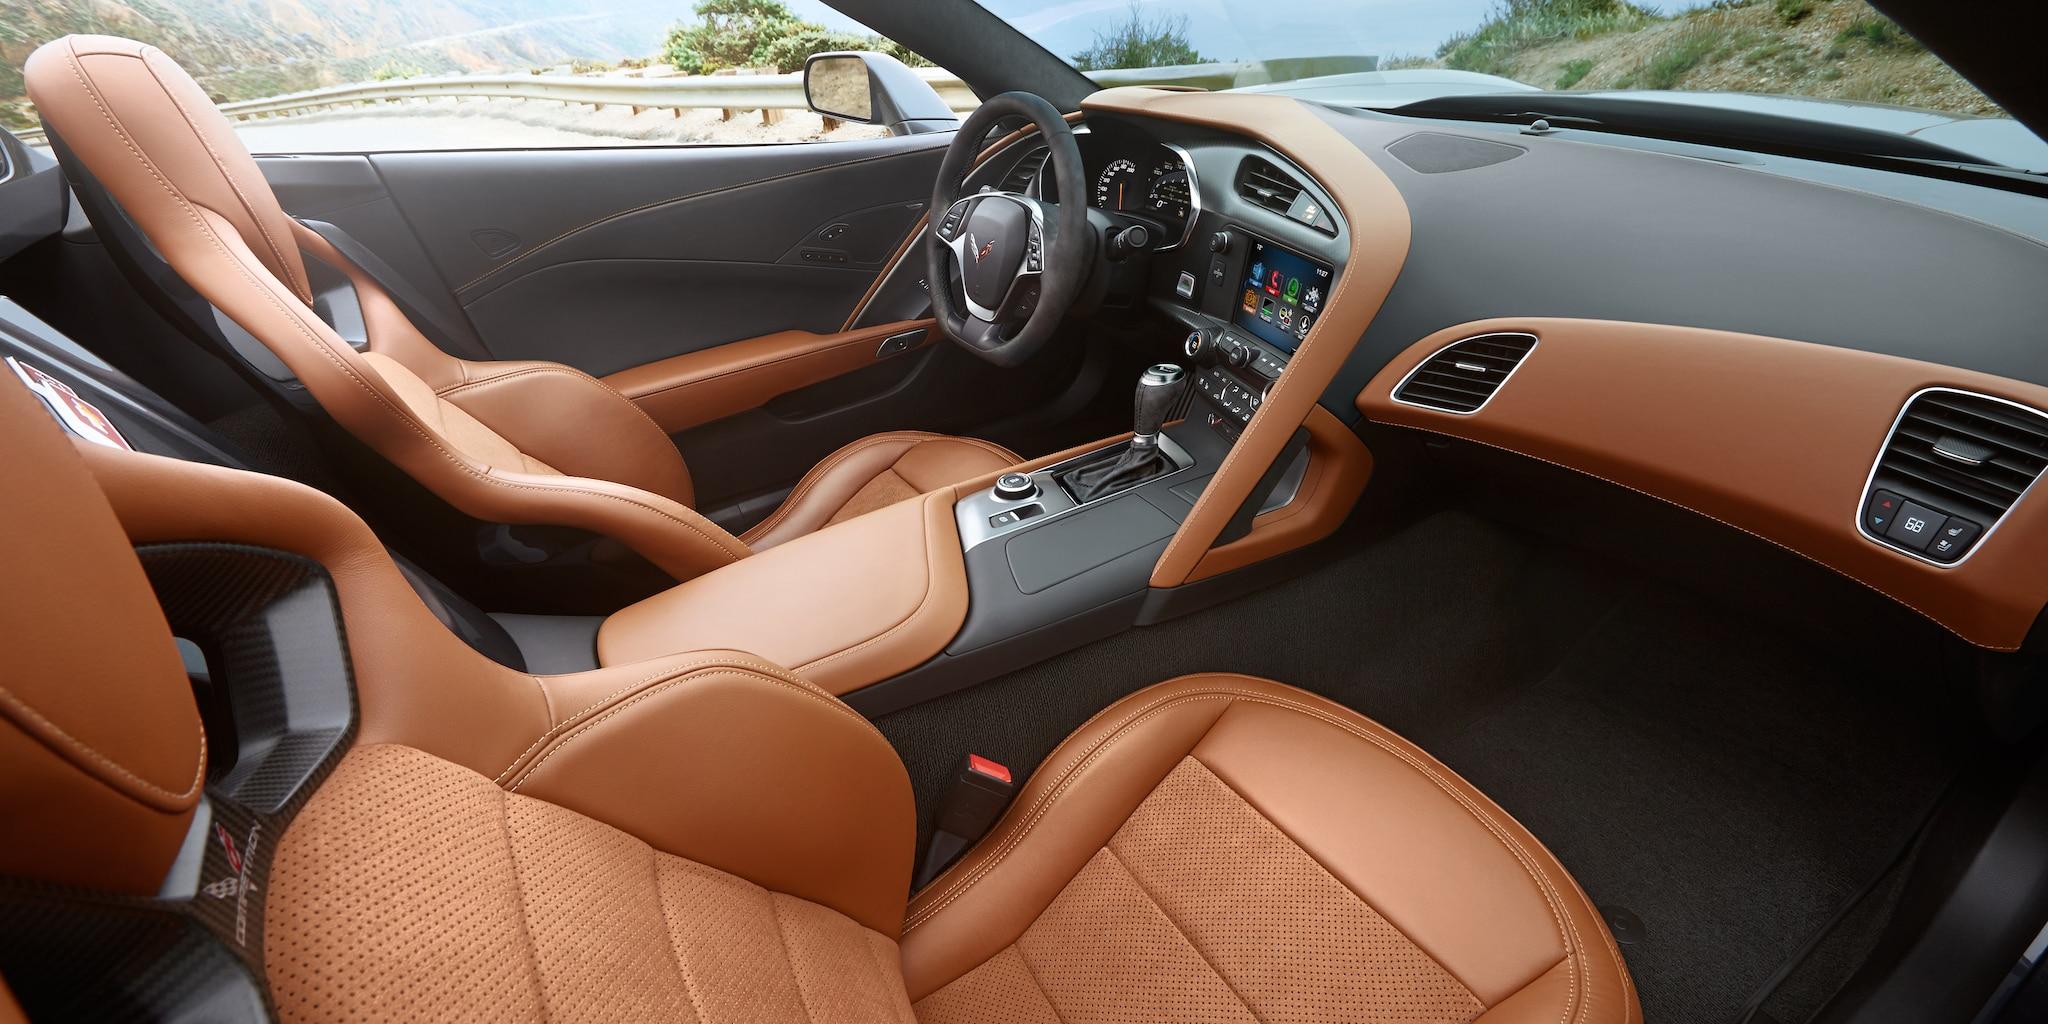 Diseño del auto deportivo Corvette Stingray 2019: cabina - Kalahari